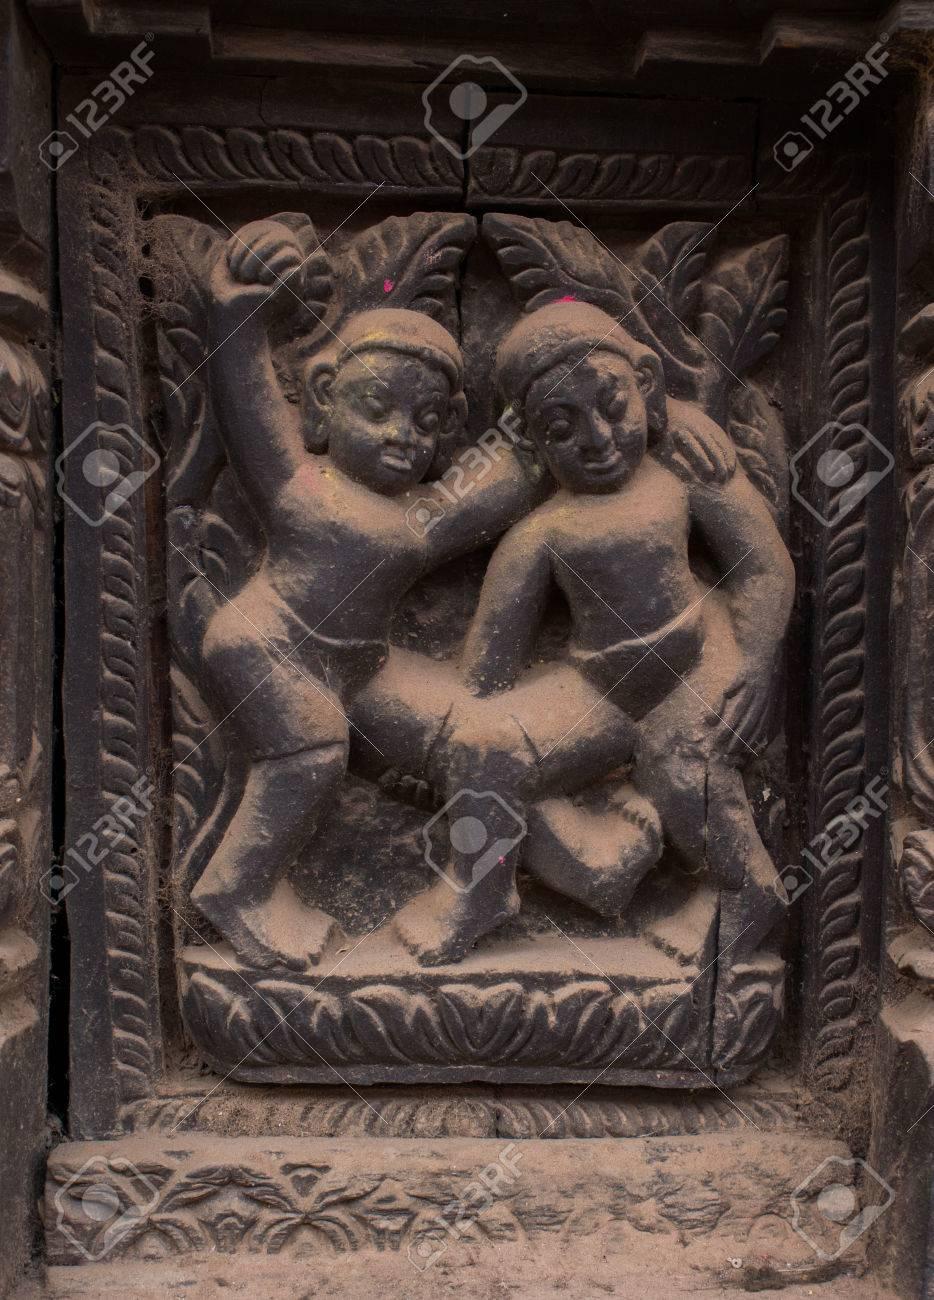 Kama sutra sex goddess